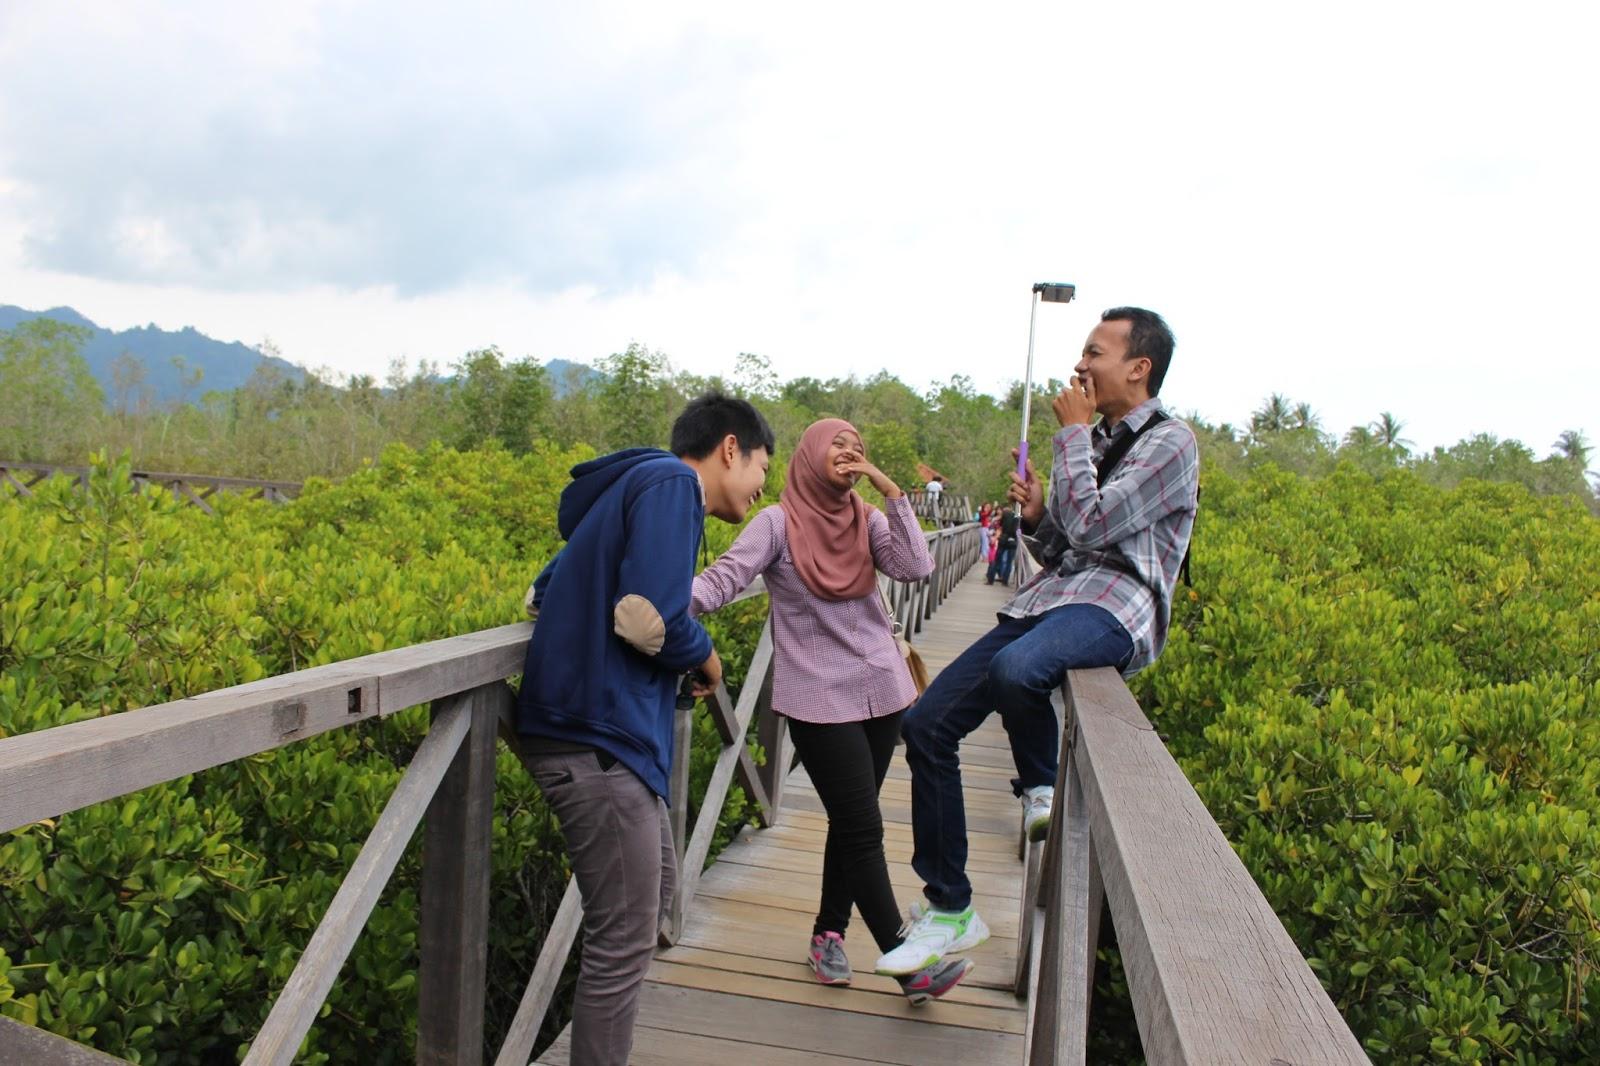 Hutan Mangrove Jembatan Galau Adventure Power Pancer Cengkrong Kab Trenggalek